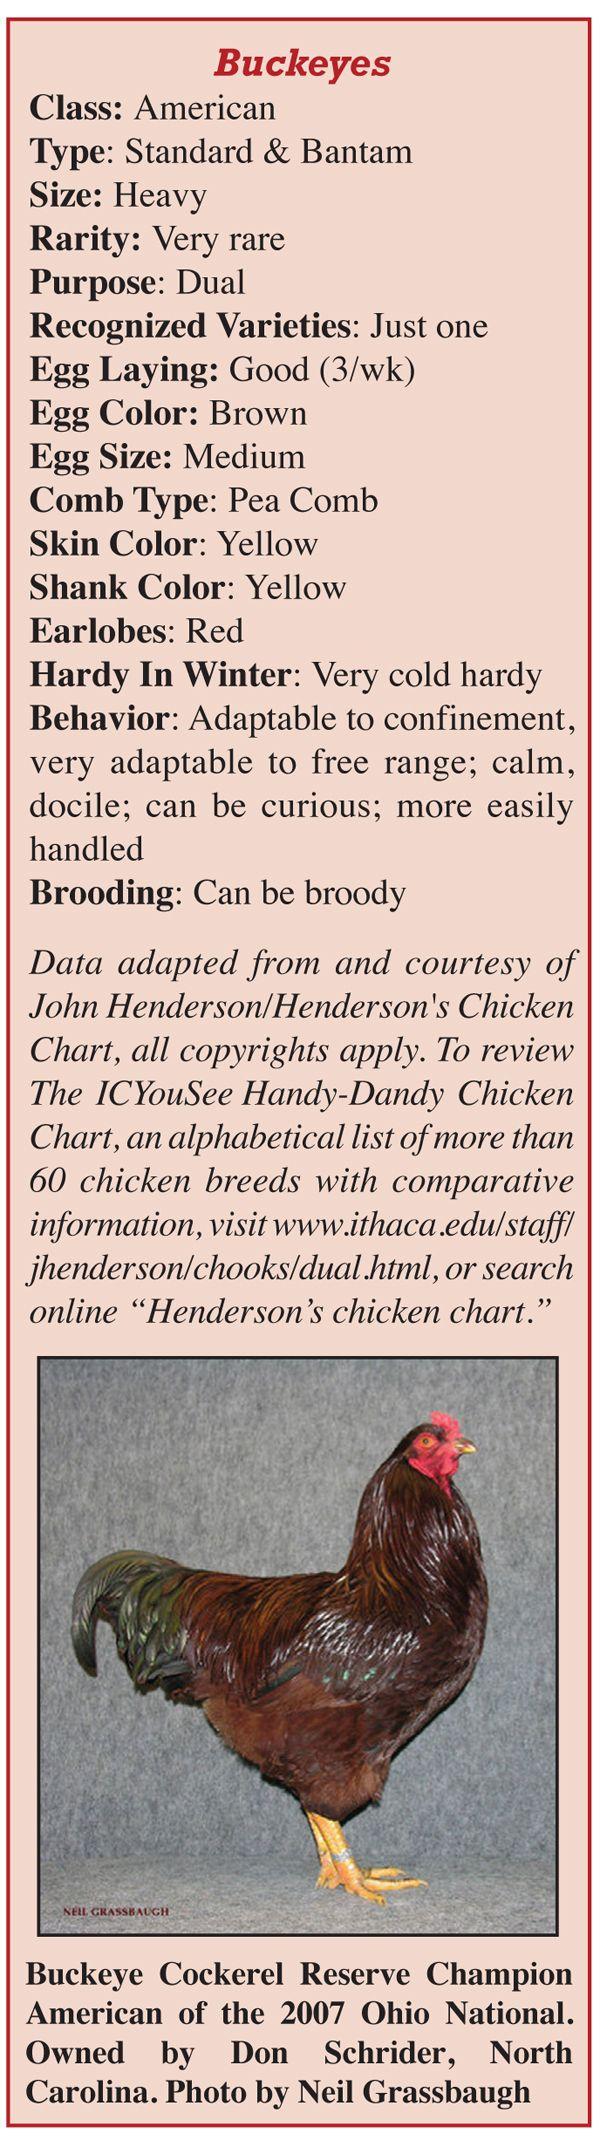 89 best chicken breeds images on pinterest breeds of chickens buckeye chickens nvjuhfo Gallery